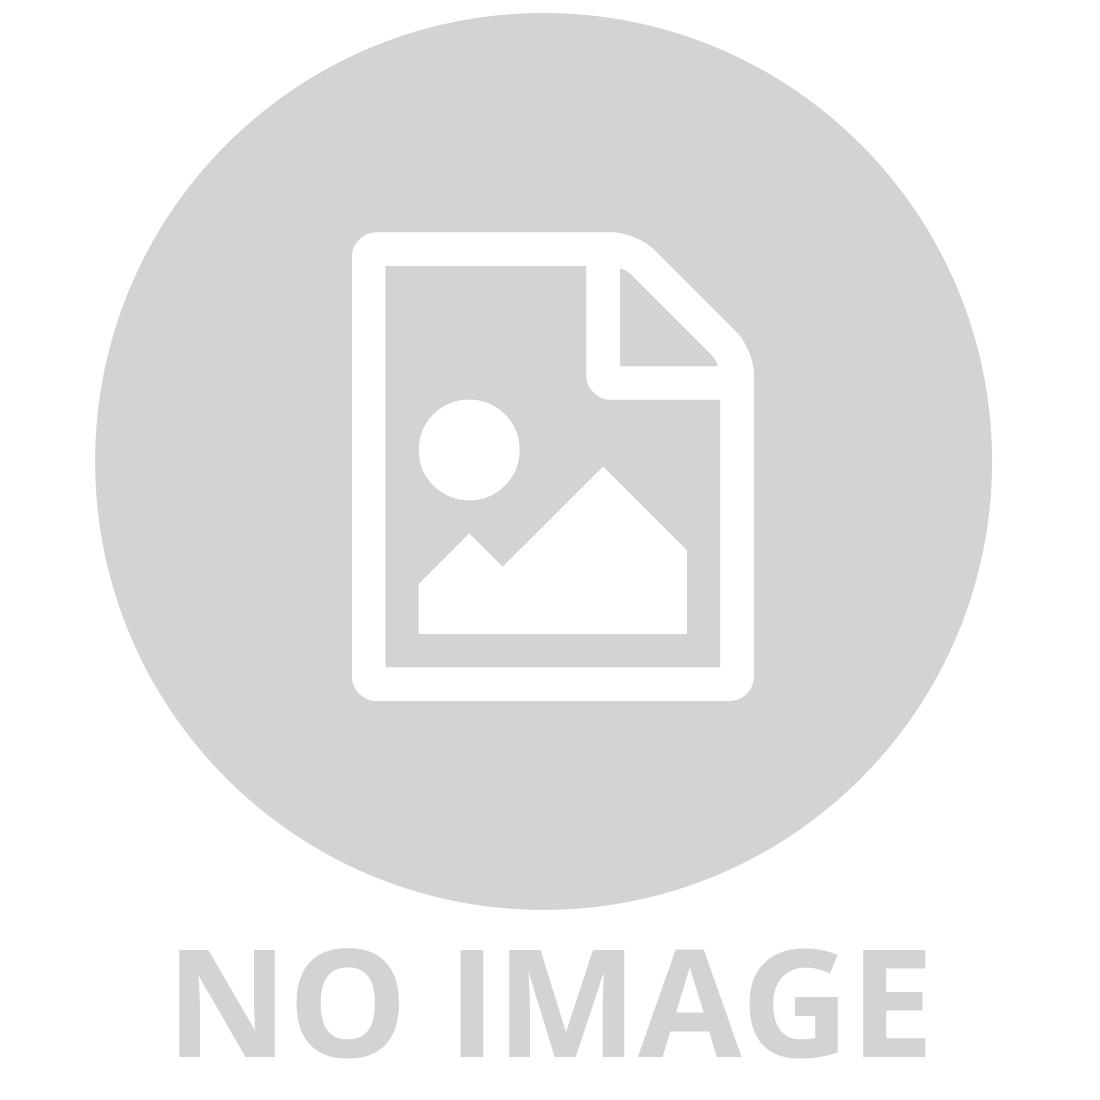 RAVENSBURGER 60 PCE CONSTRUCTION CROWD JIGSAW PUZZLE